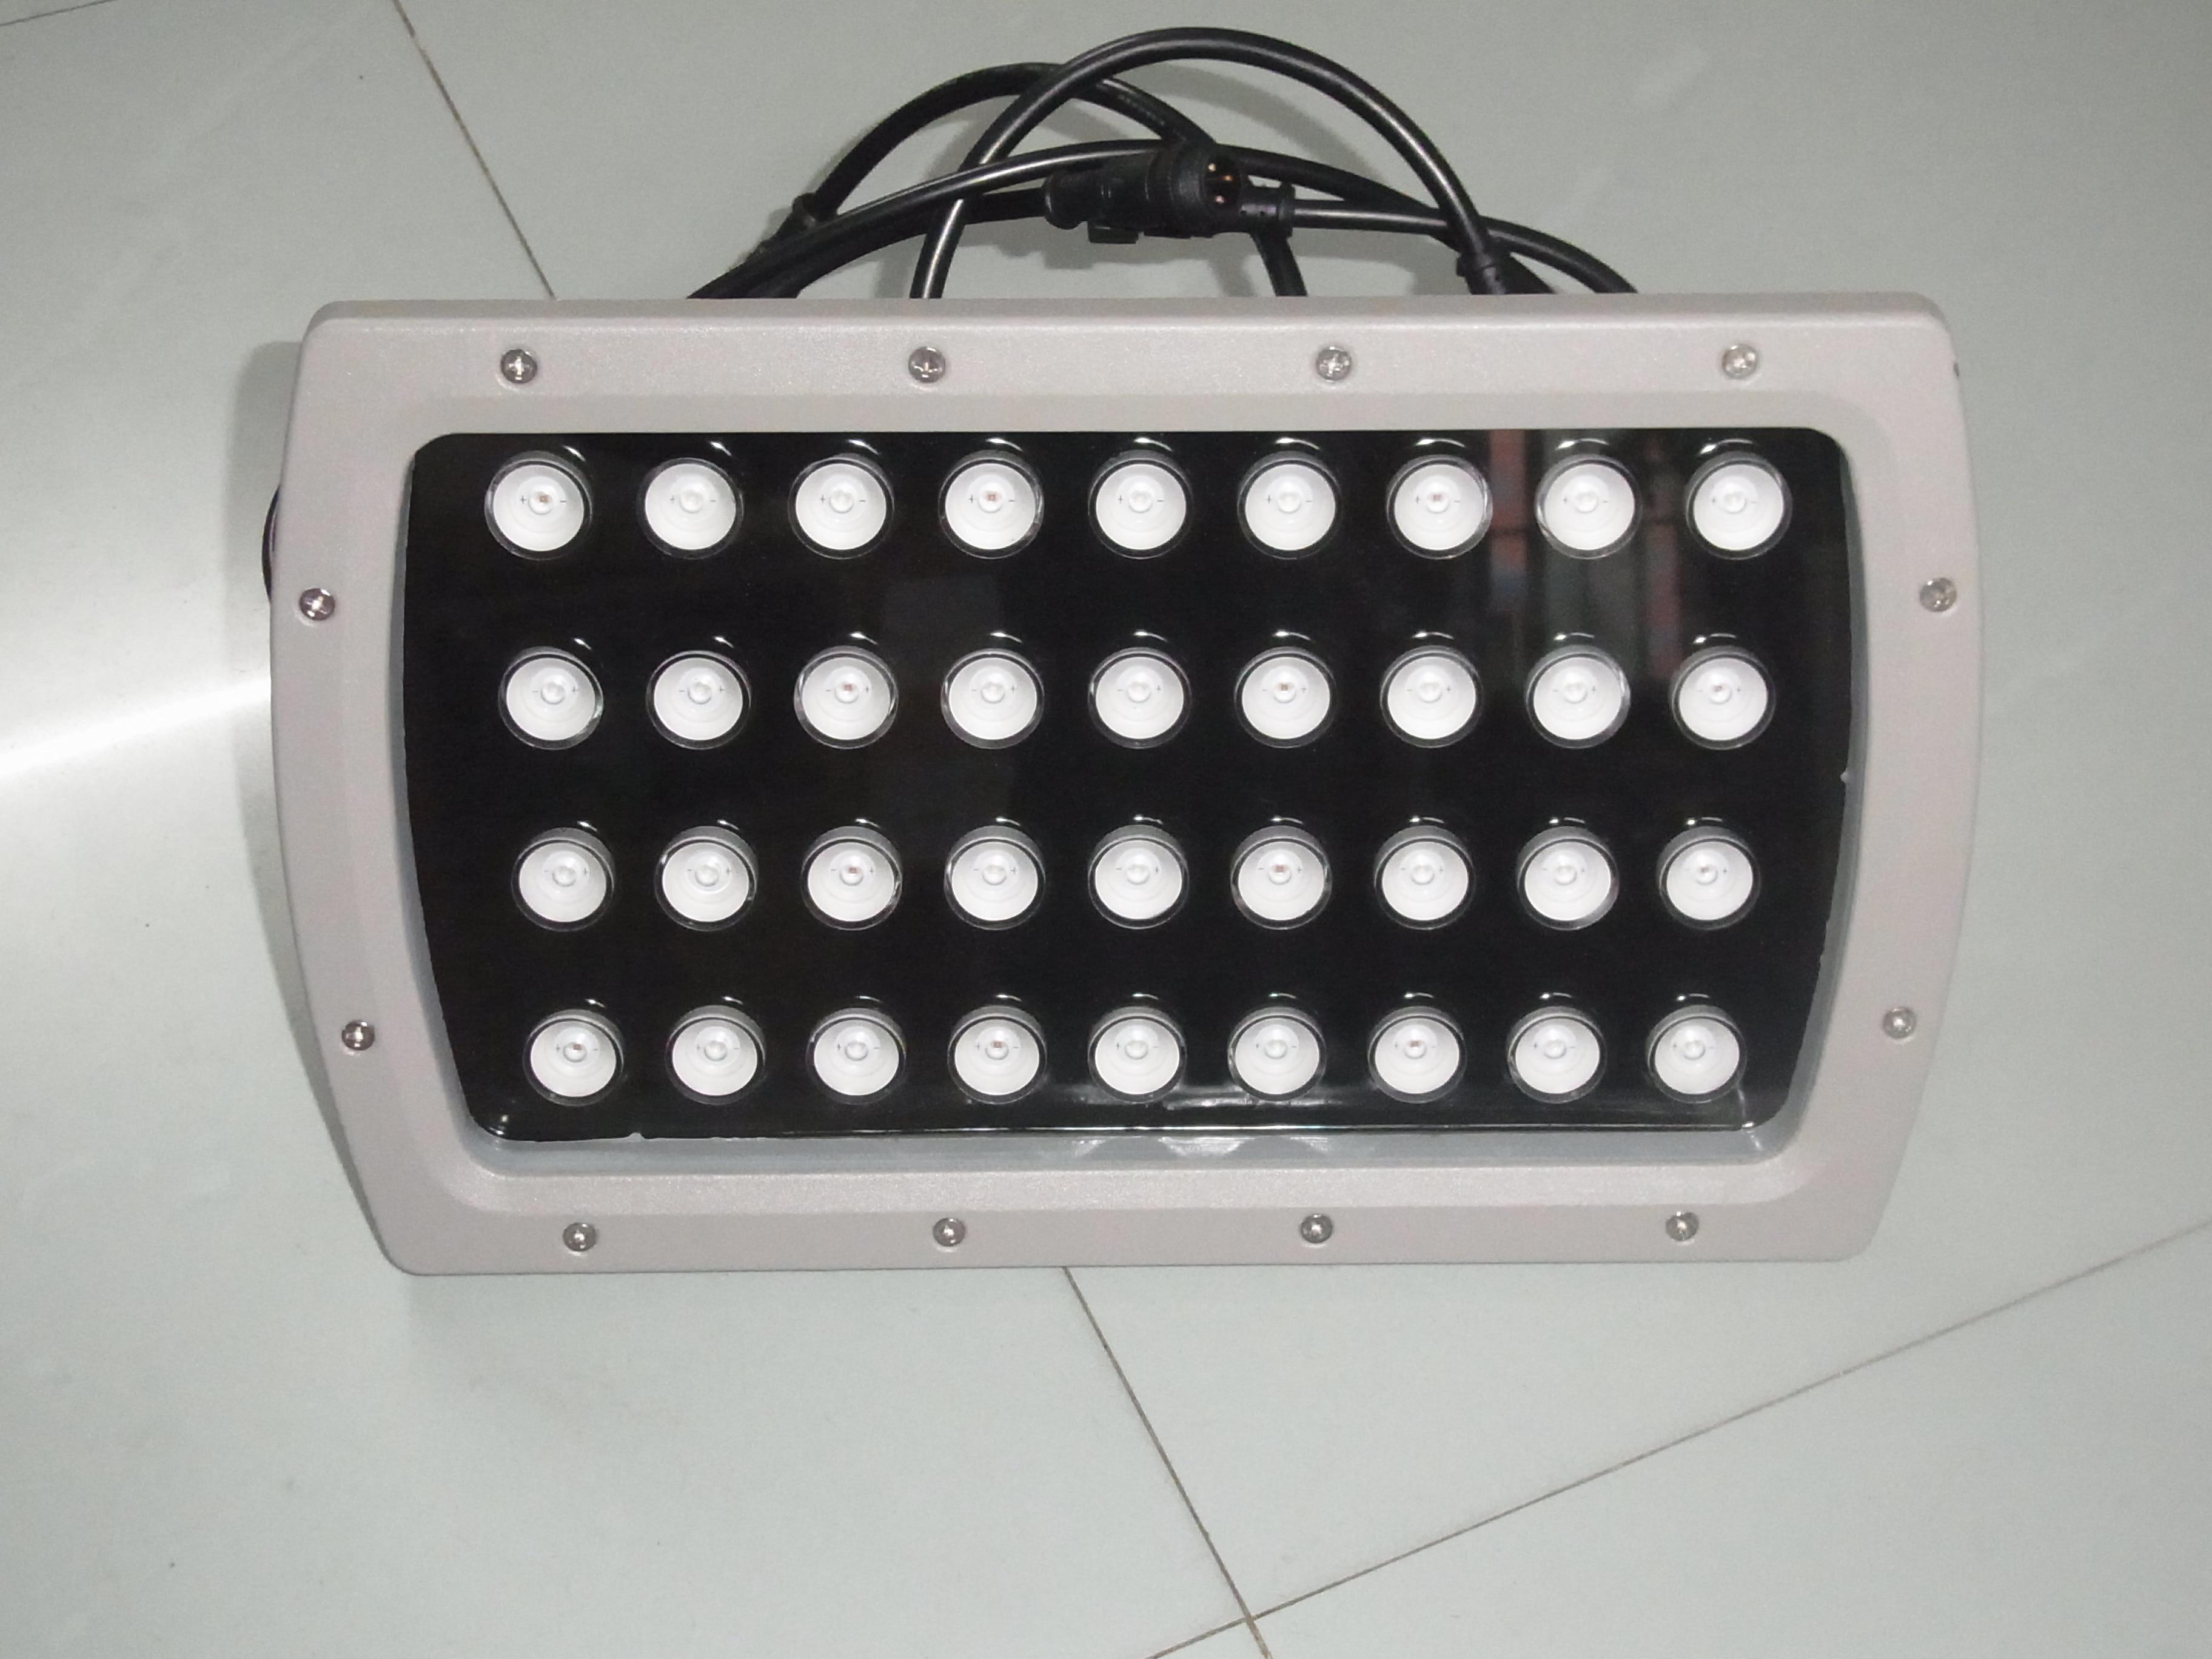 Conexión rápida 36W LED reflector IP66 RGB a todo color jardín paisaje luces 24V 110V 220V DMX512 al aire libre led foco